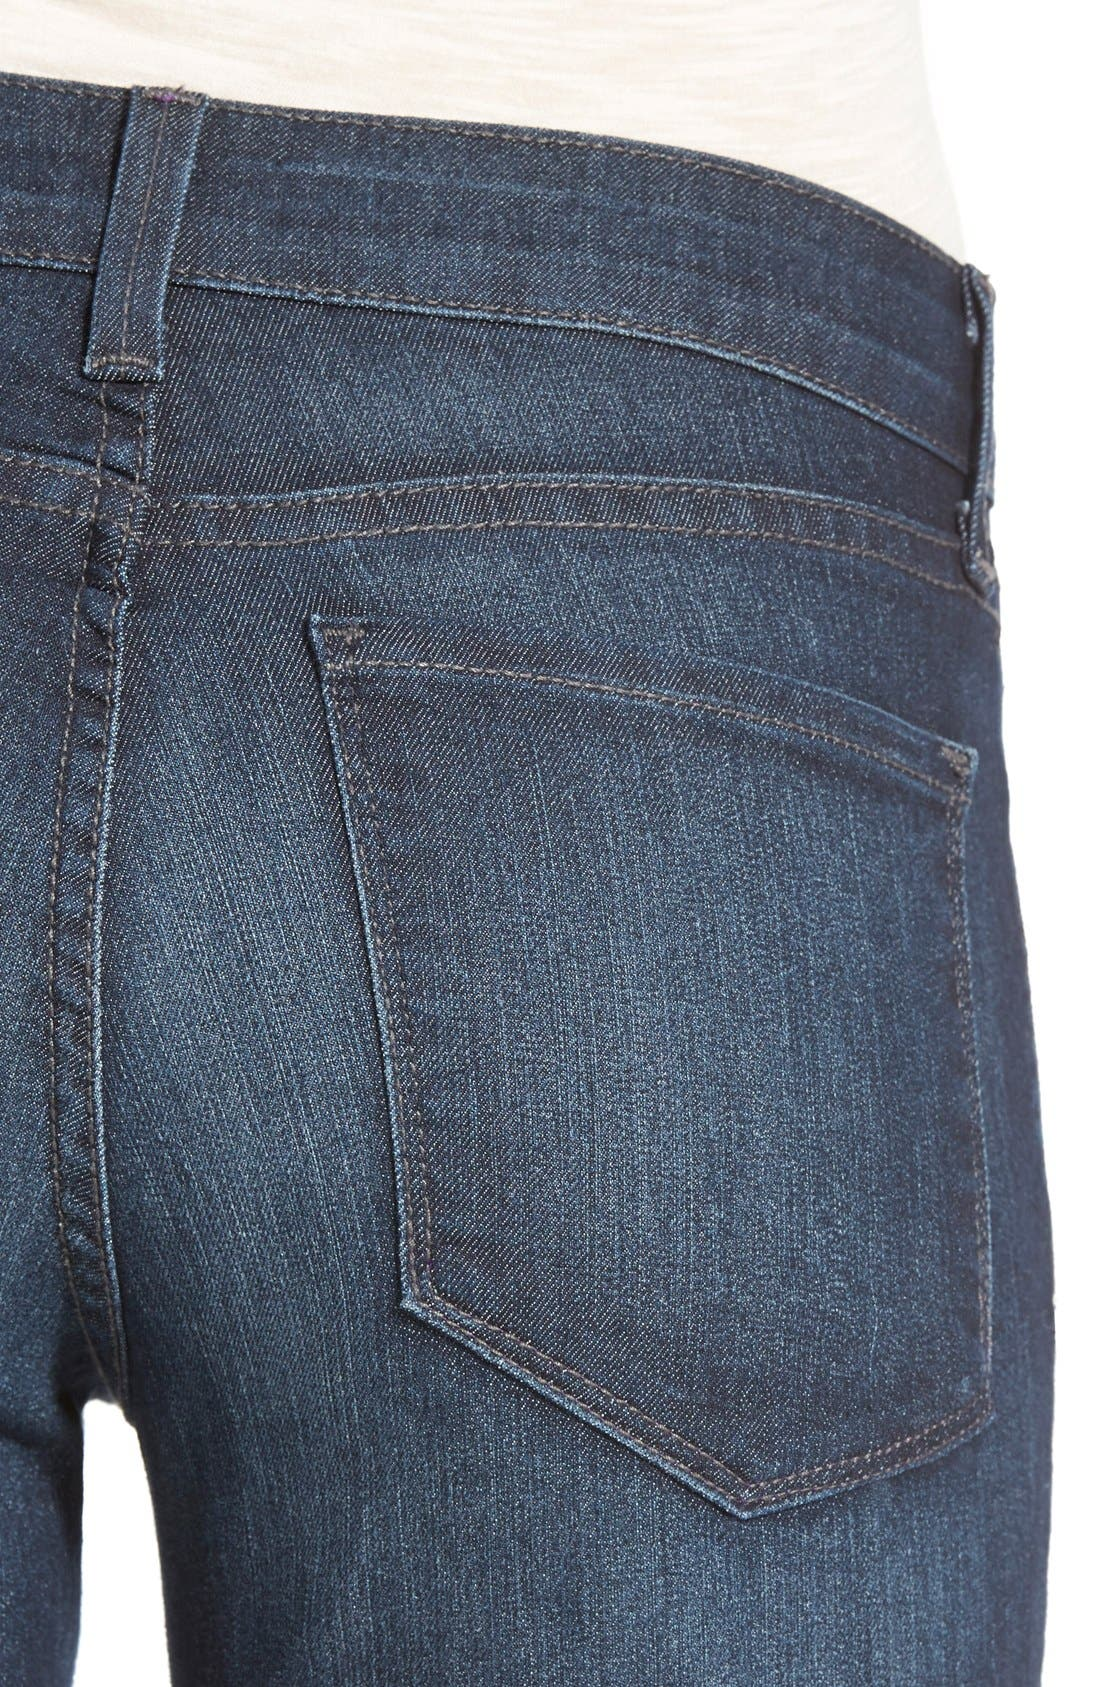 'Billie' Stretch Mini Bootcut Jeans,                             Alternate thumbnail 3, color,